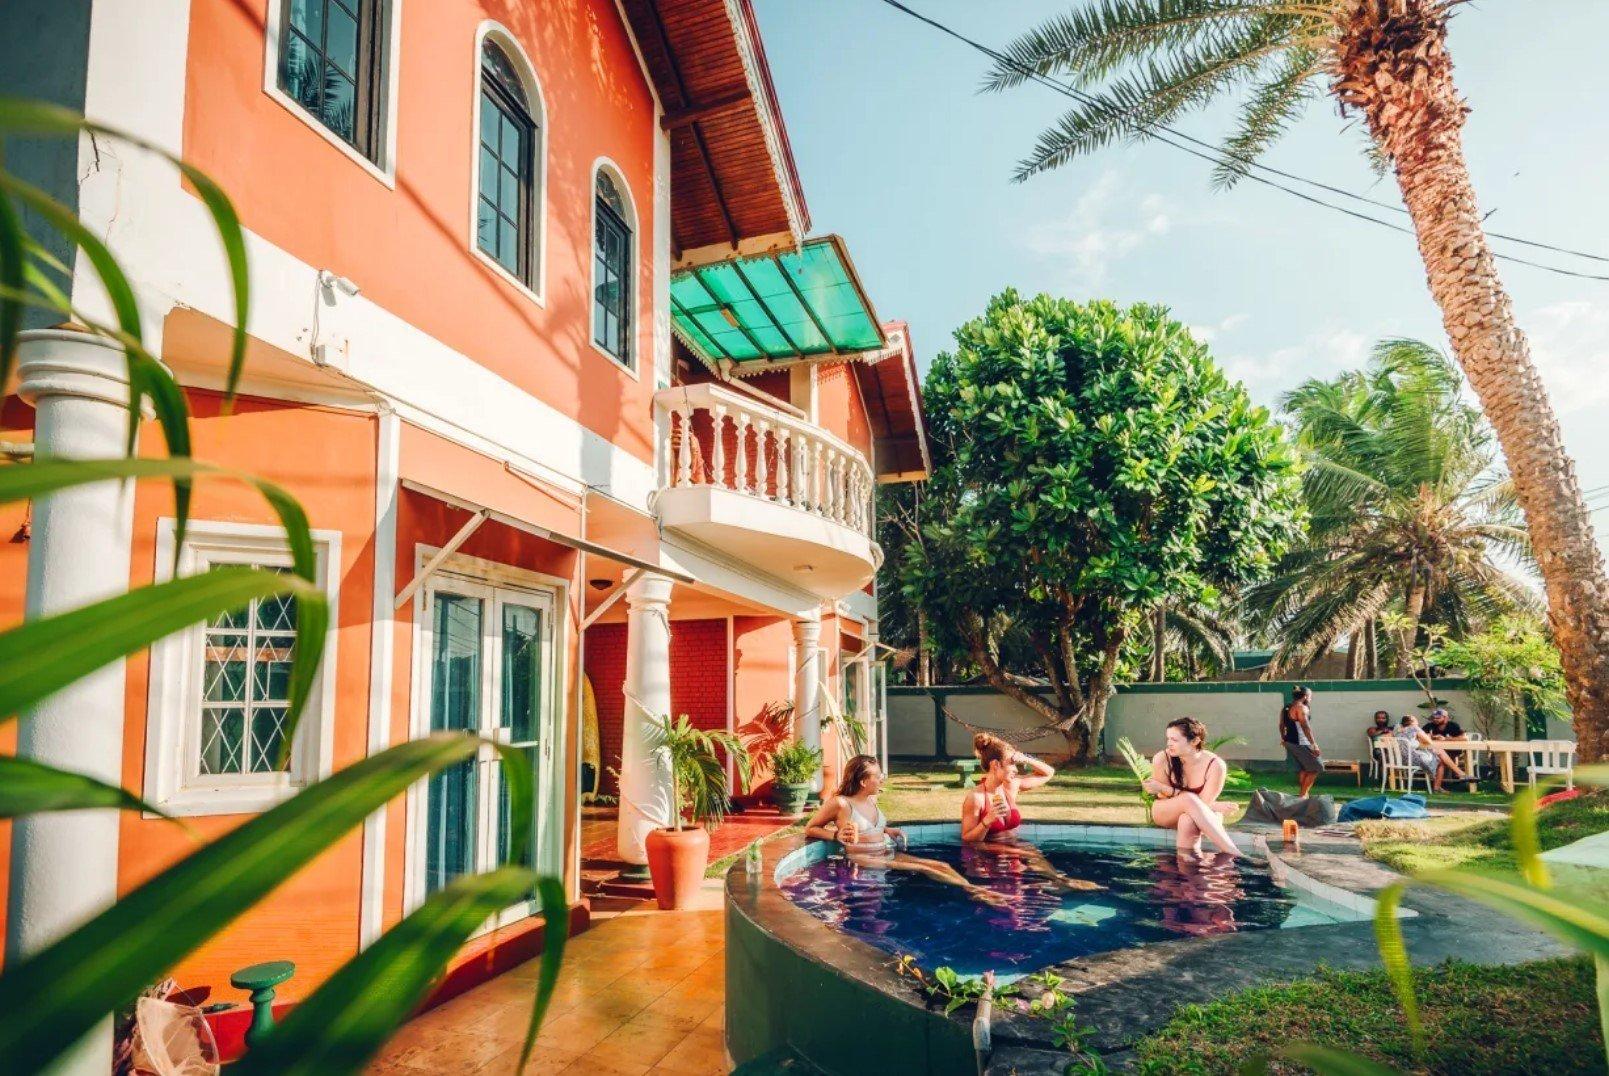 Where to Stay in Negombo: YoYo Beach Hostel